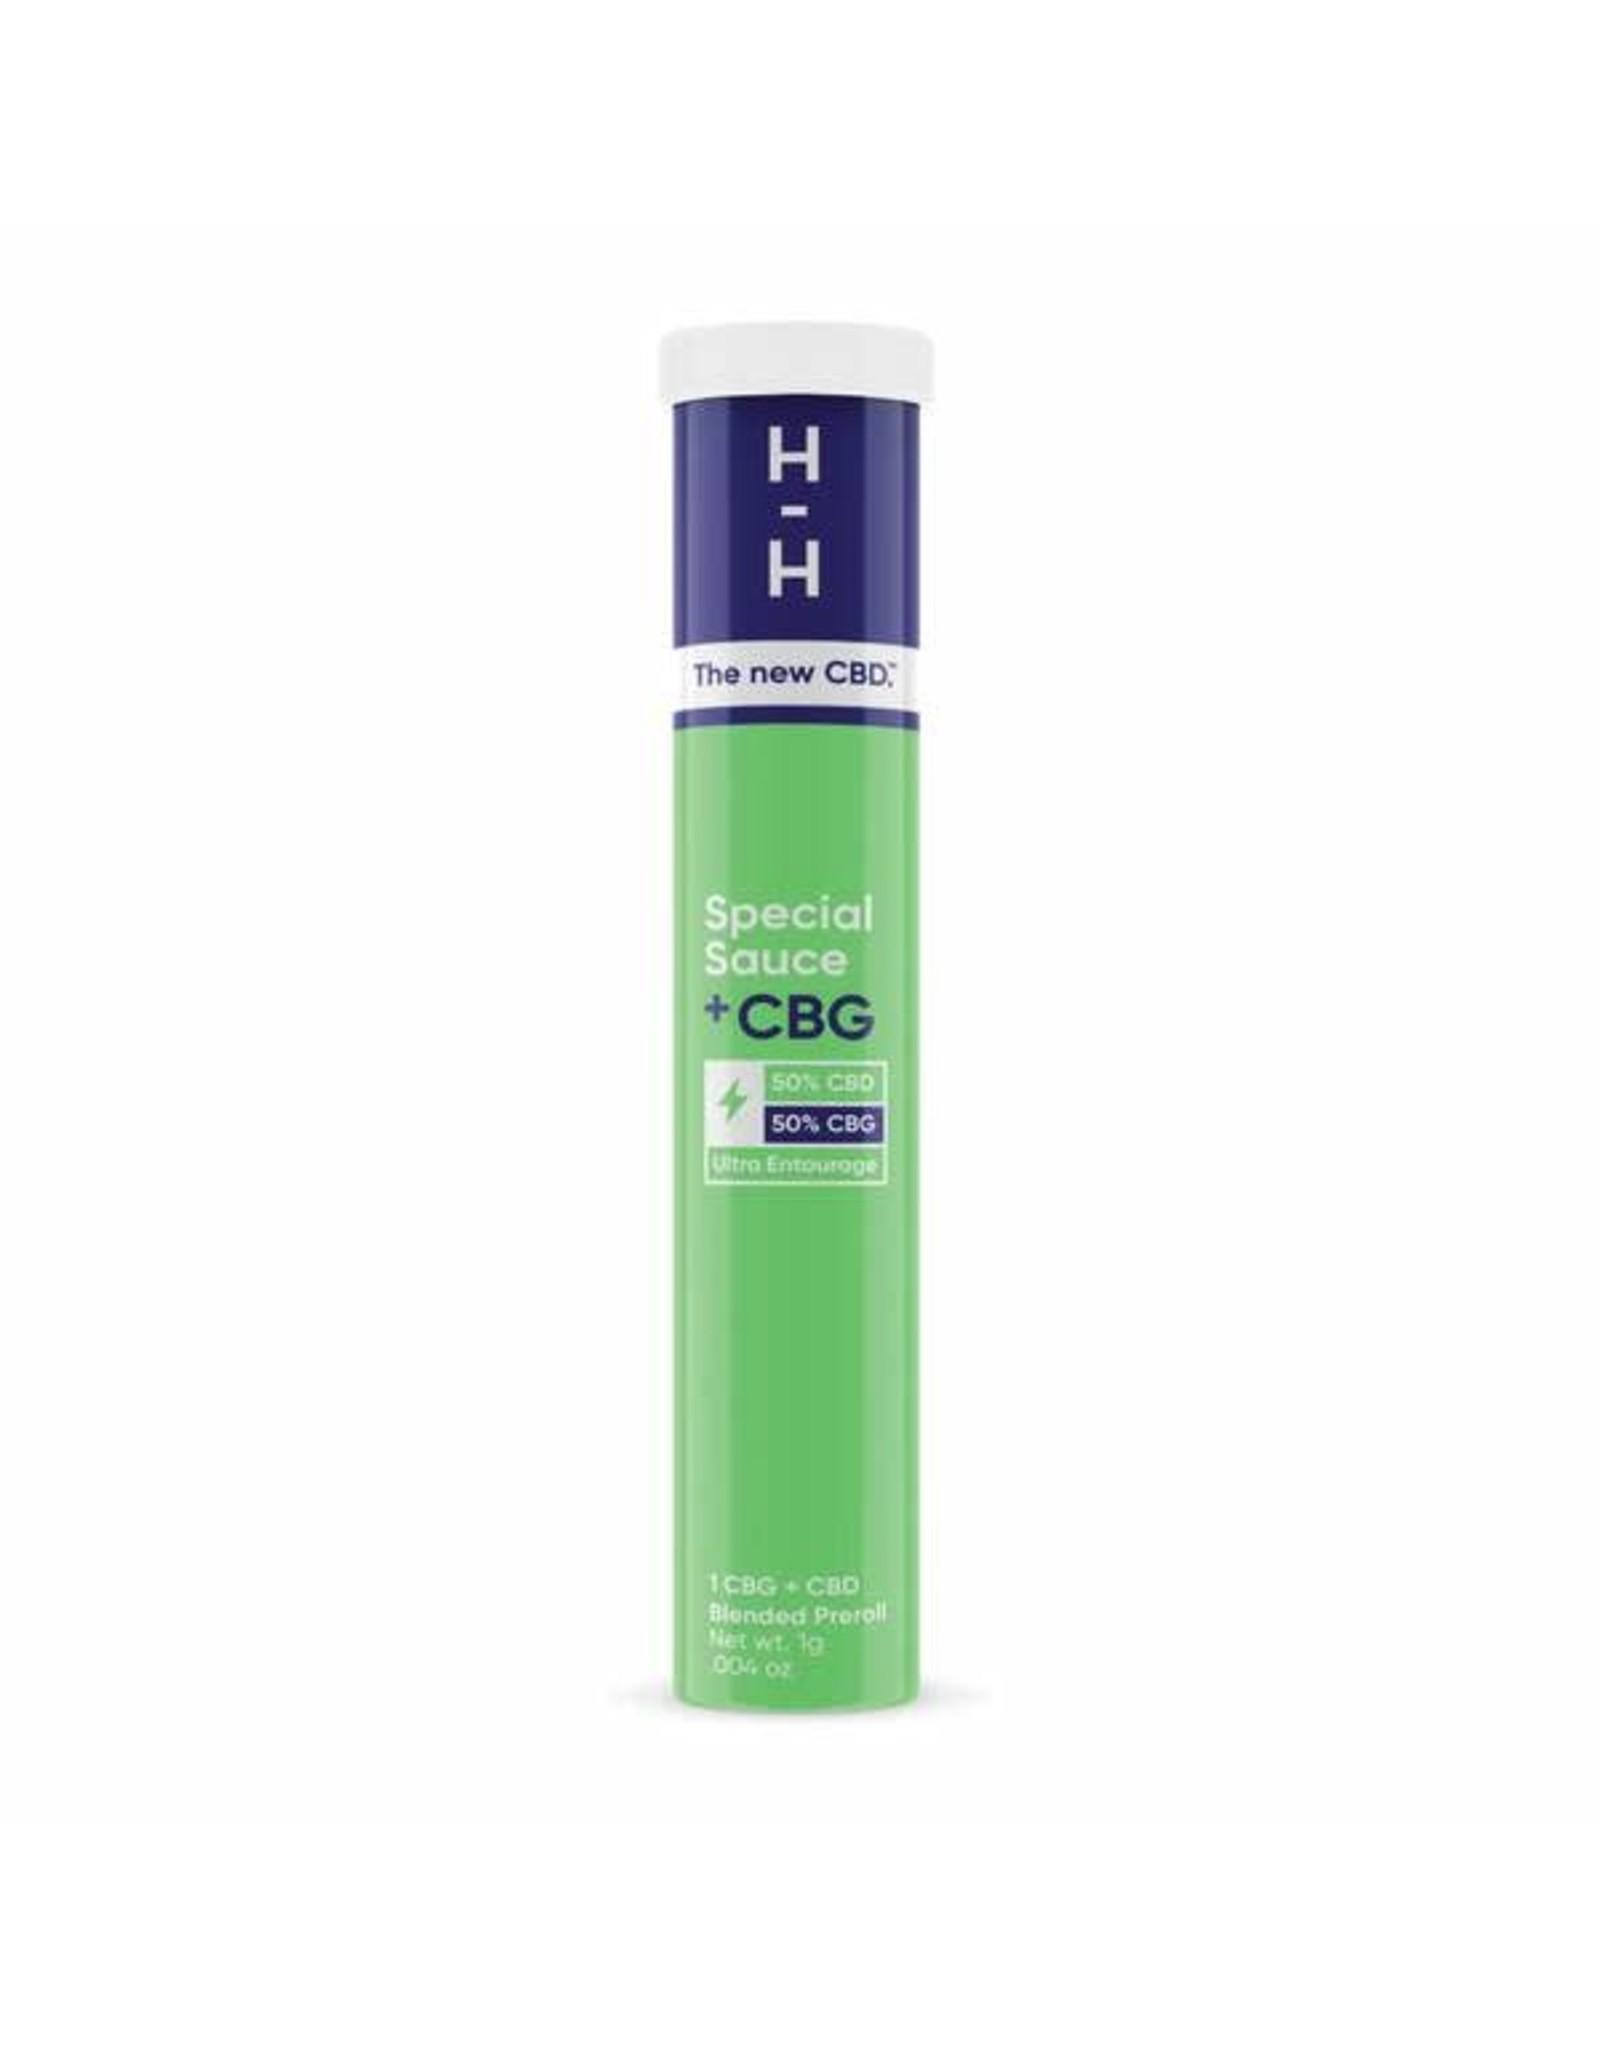 HHemp HHemp Preroll CBG+CBD  Special Sauce Indica 1gr